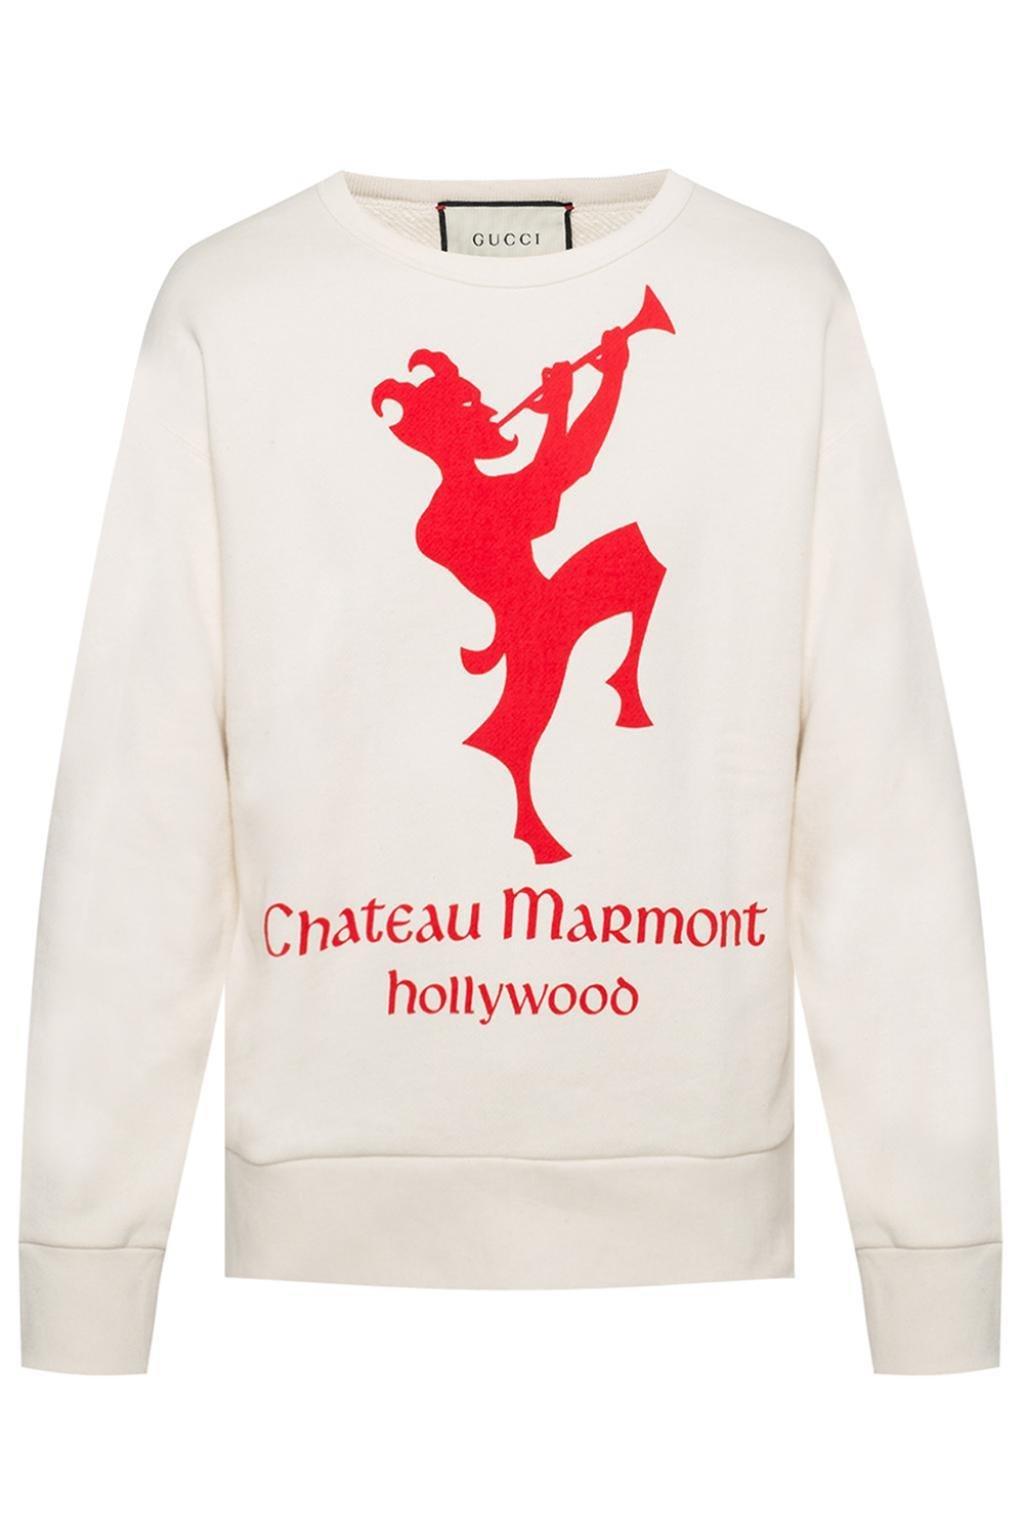 35729546734 Lyst - Gucci Logo-printed Sweatshirt for Men